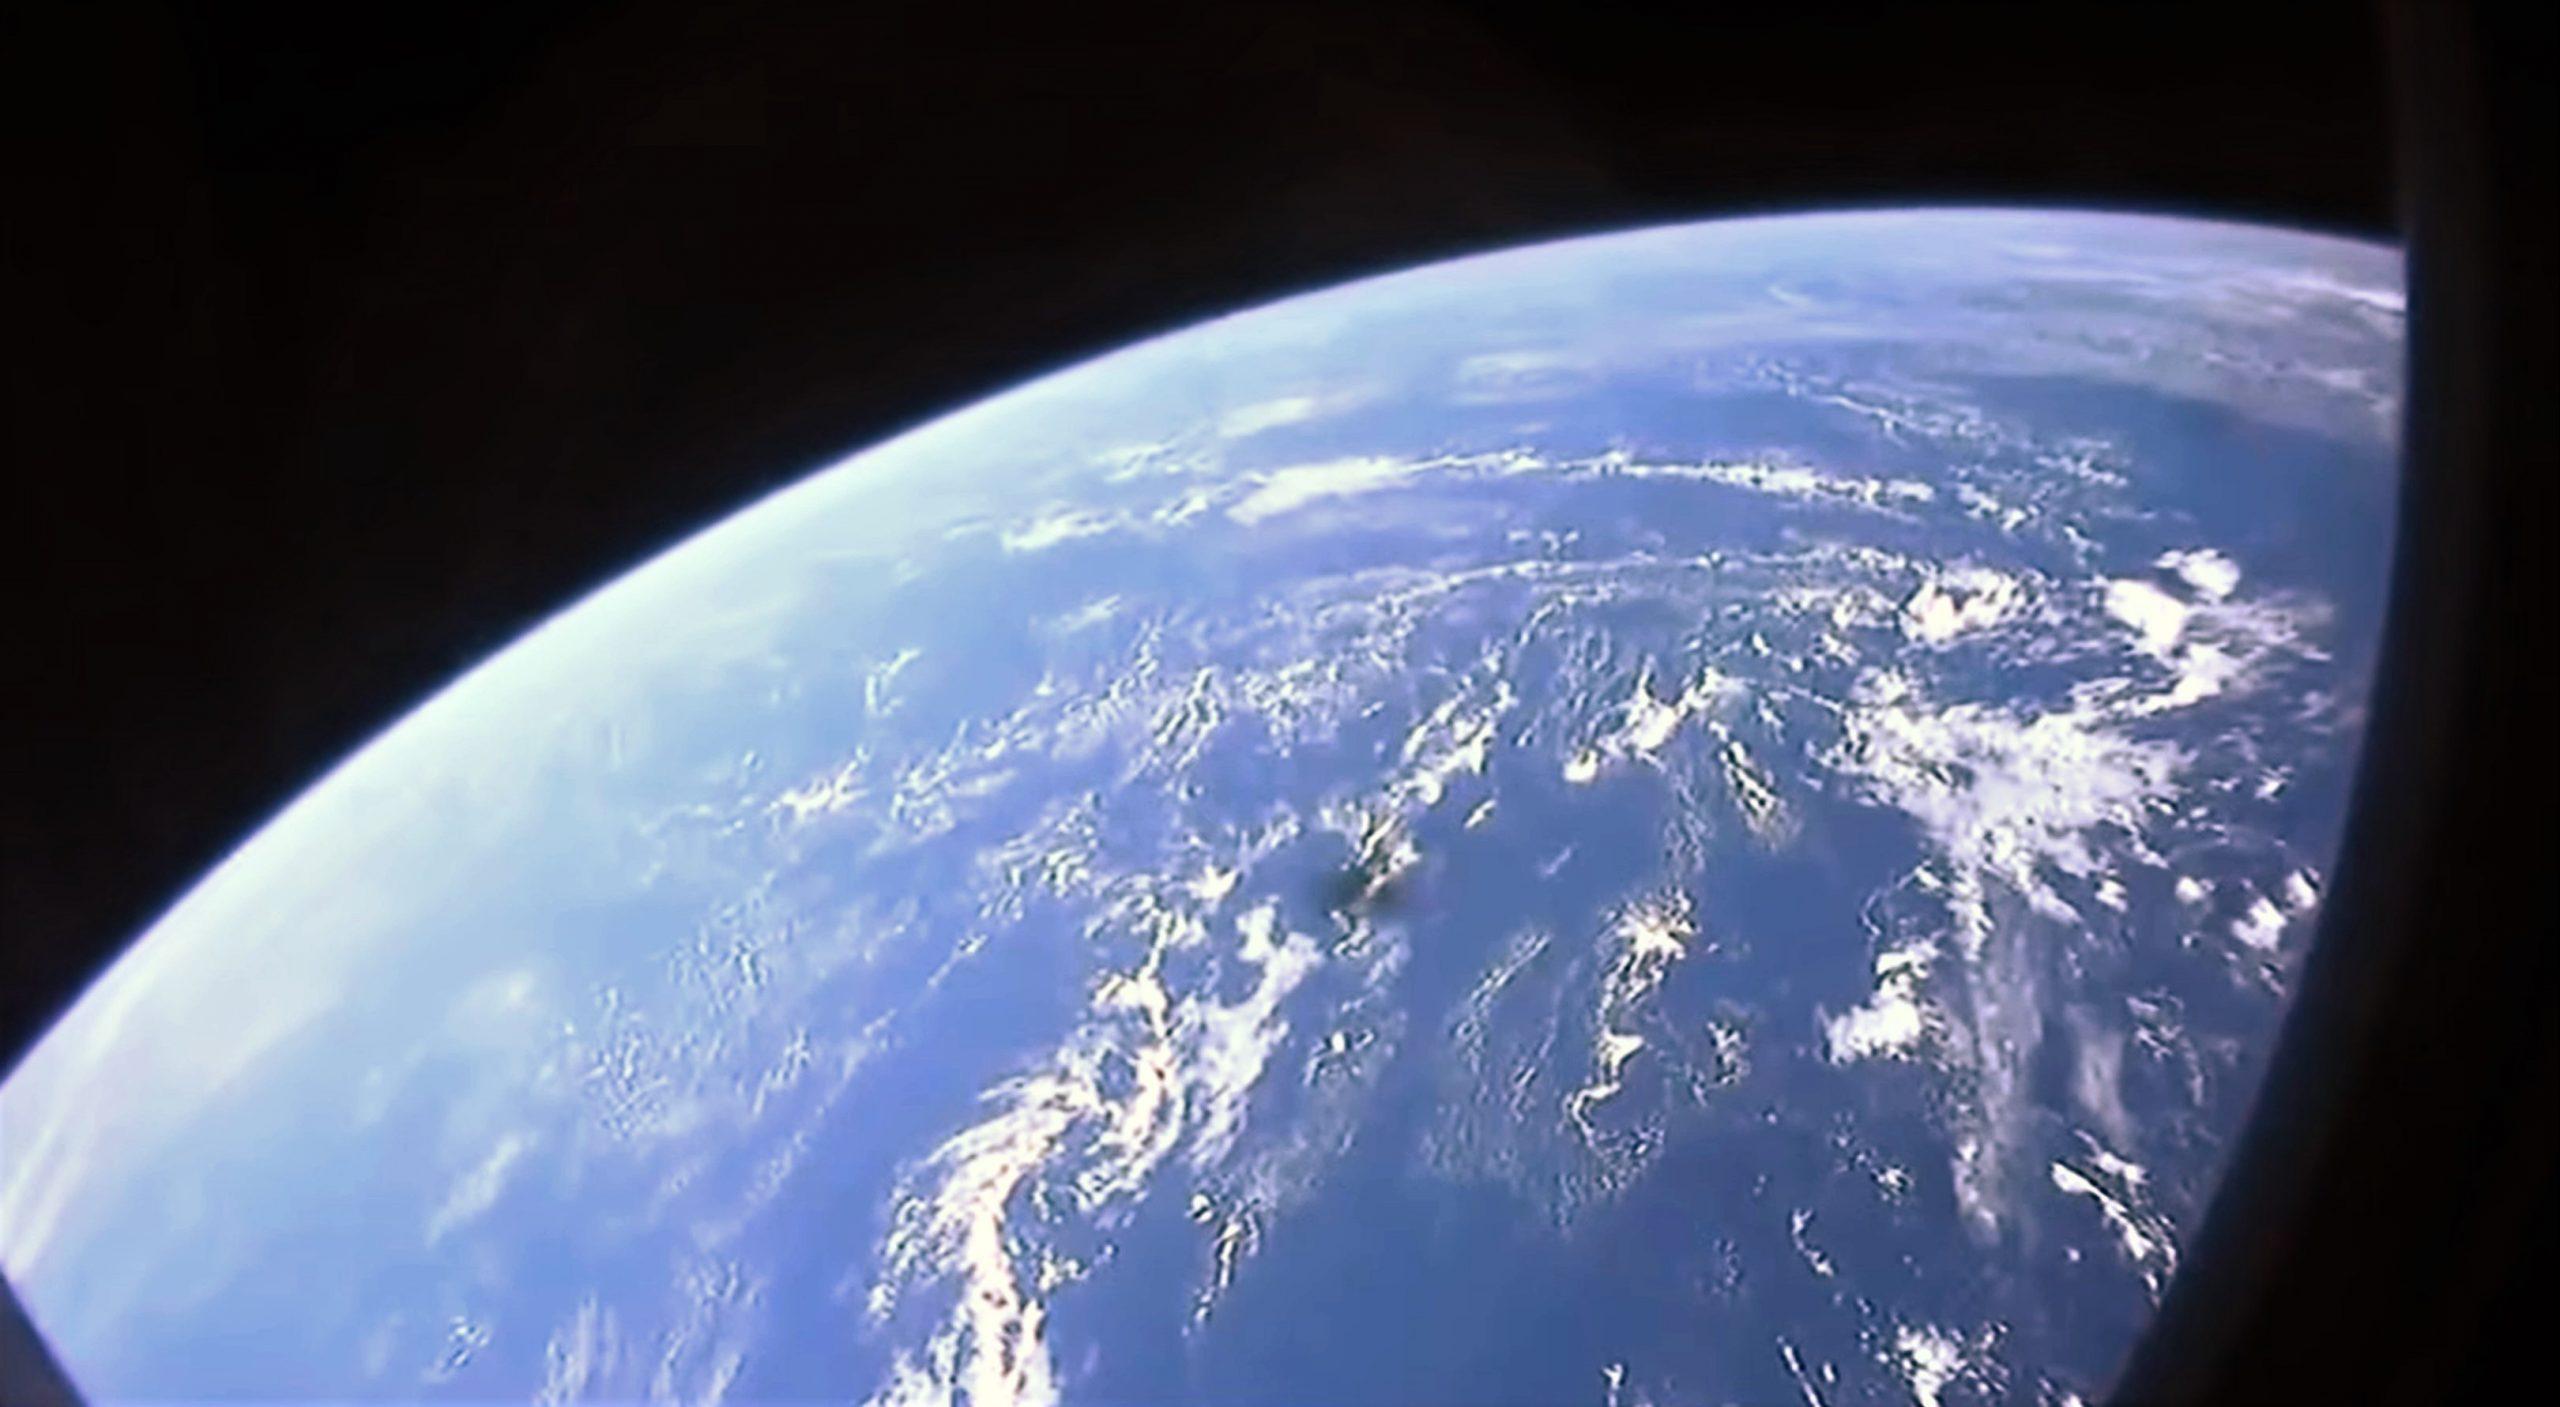 Crew-1 Crew Dragon C207 Falcon 9 B1061 webcast 111620 (NASA) window view 1